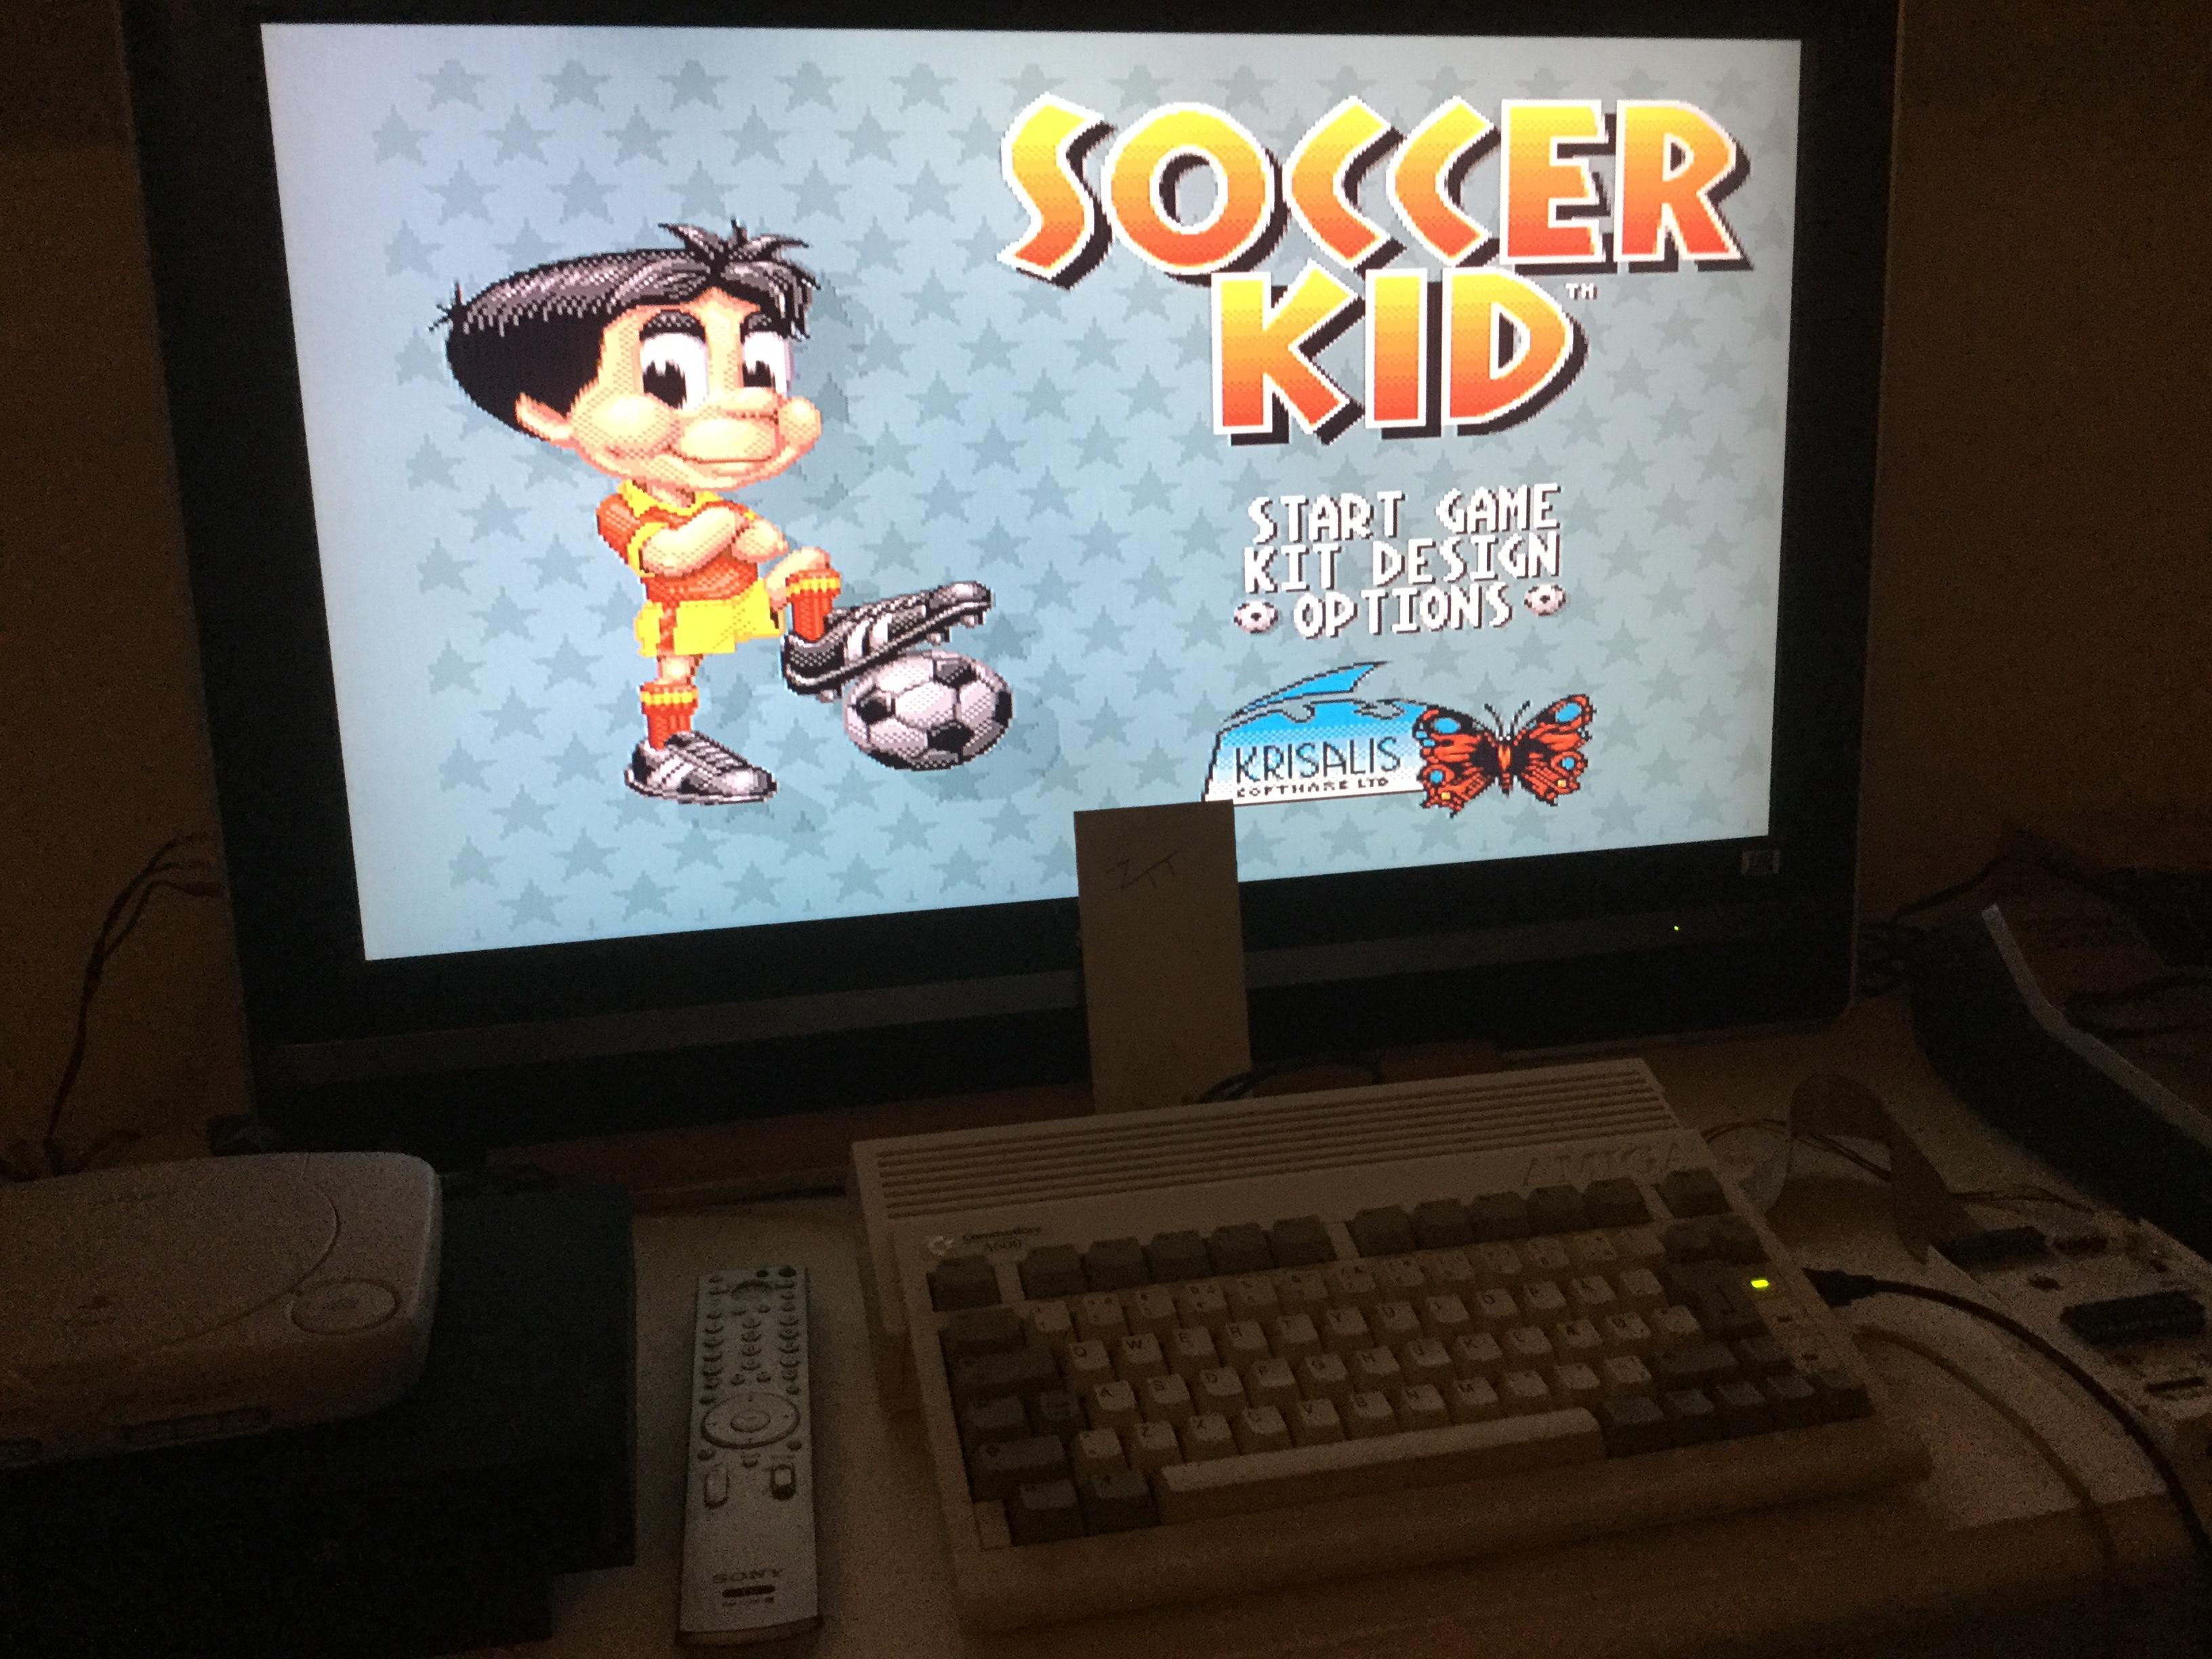 Frankie: Soccer Kid (Amiga) 1,065,720 points on 2020-08-06 05:00:11